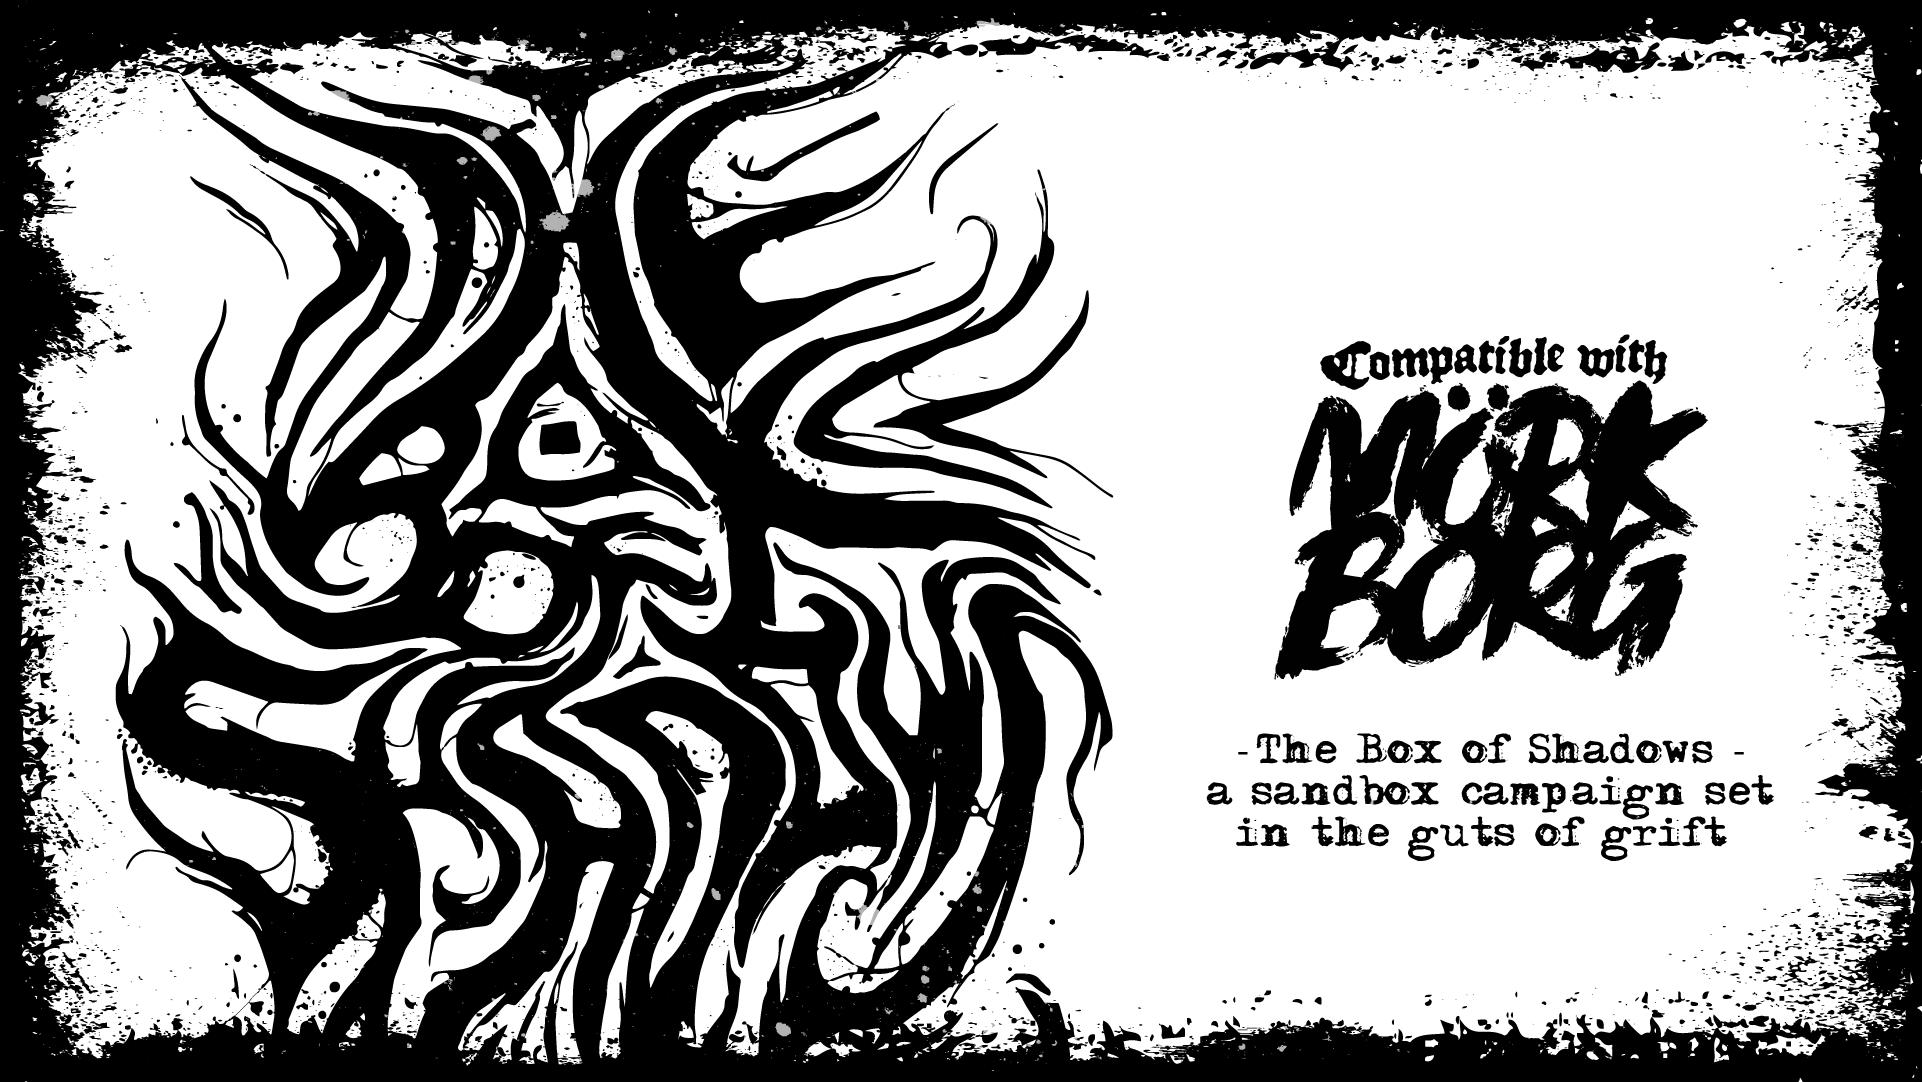 The Box of Shadows